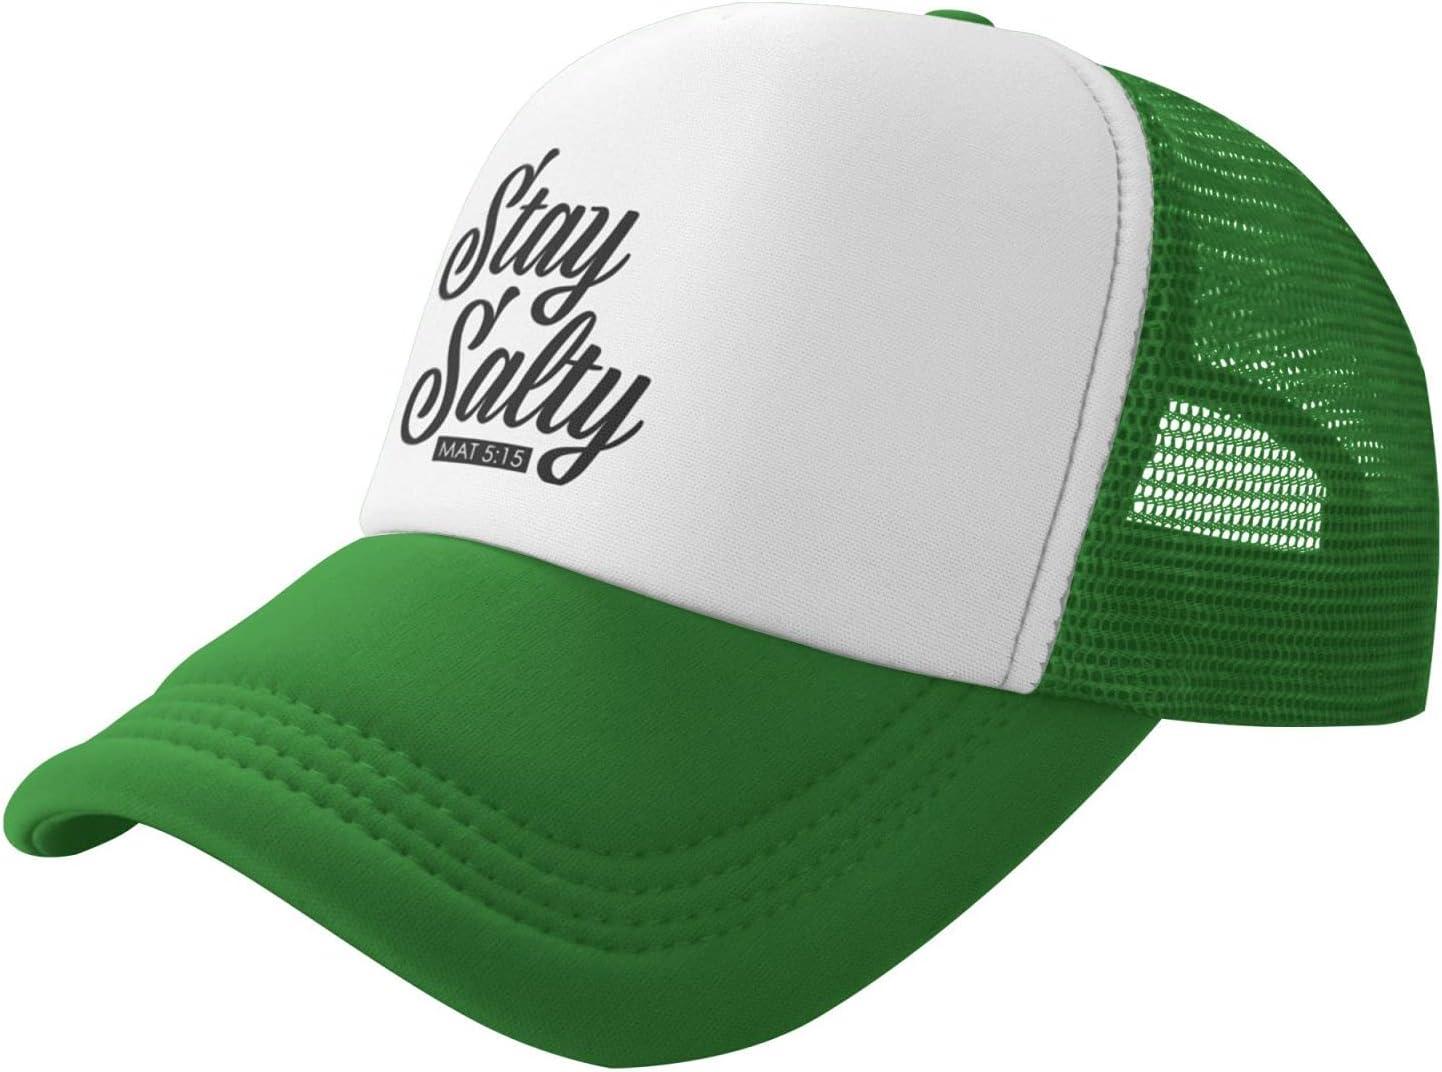 List price Nieah Stay Salty New sales Trucker Baseball Cap hat